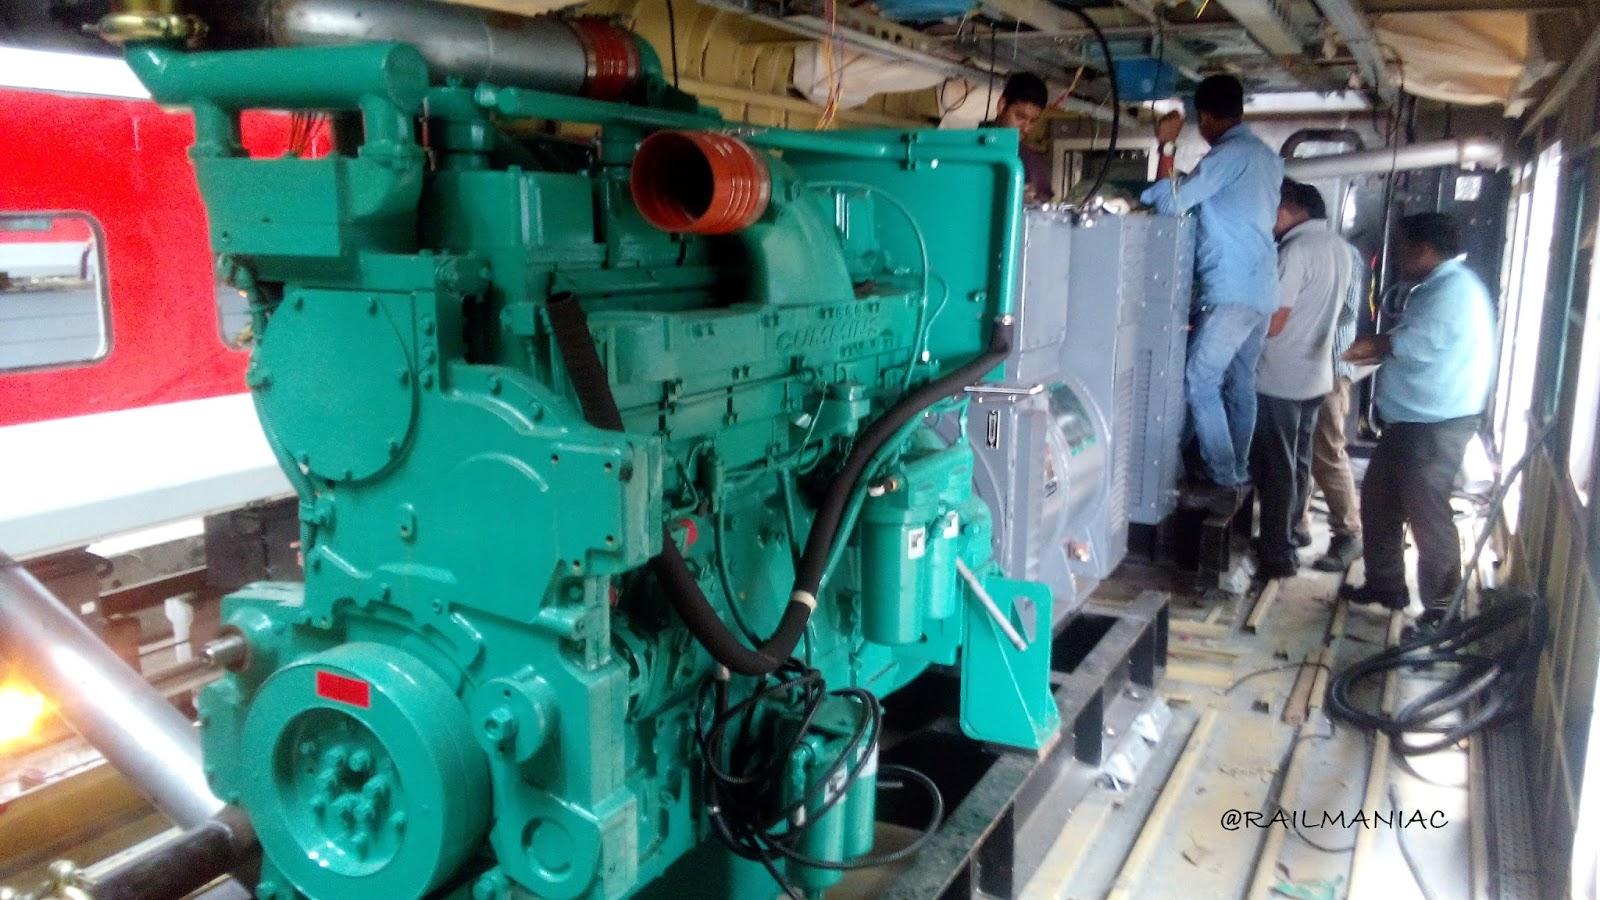 Central Air Compressor